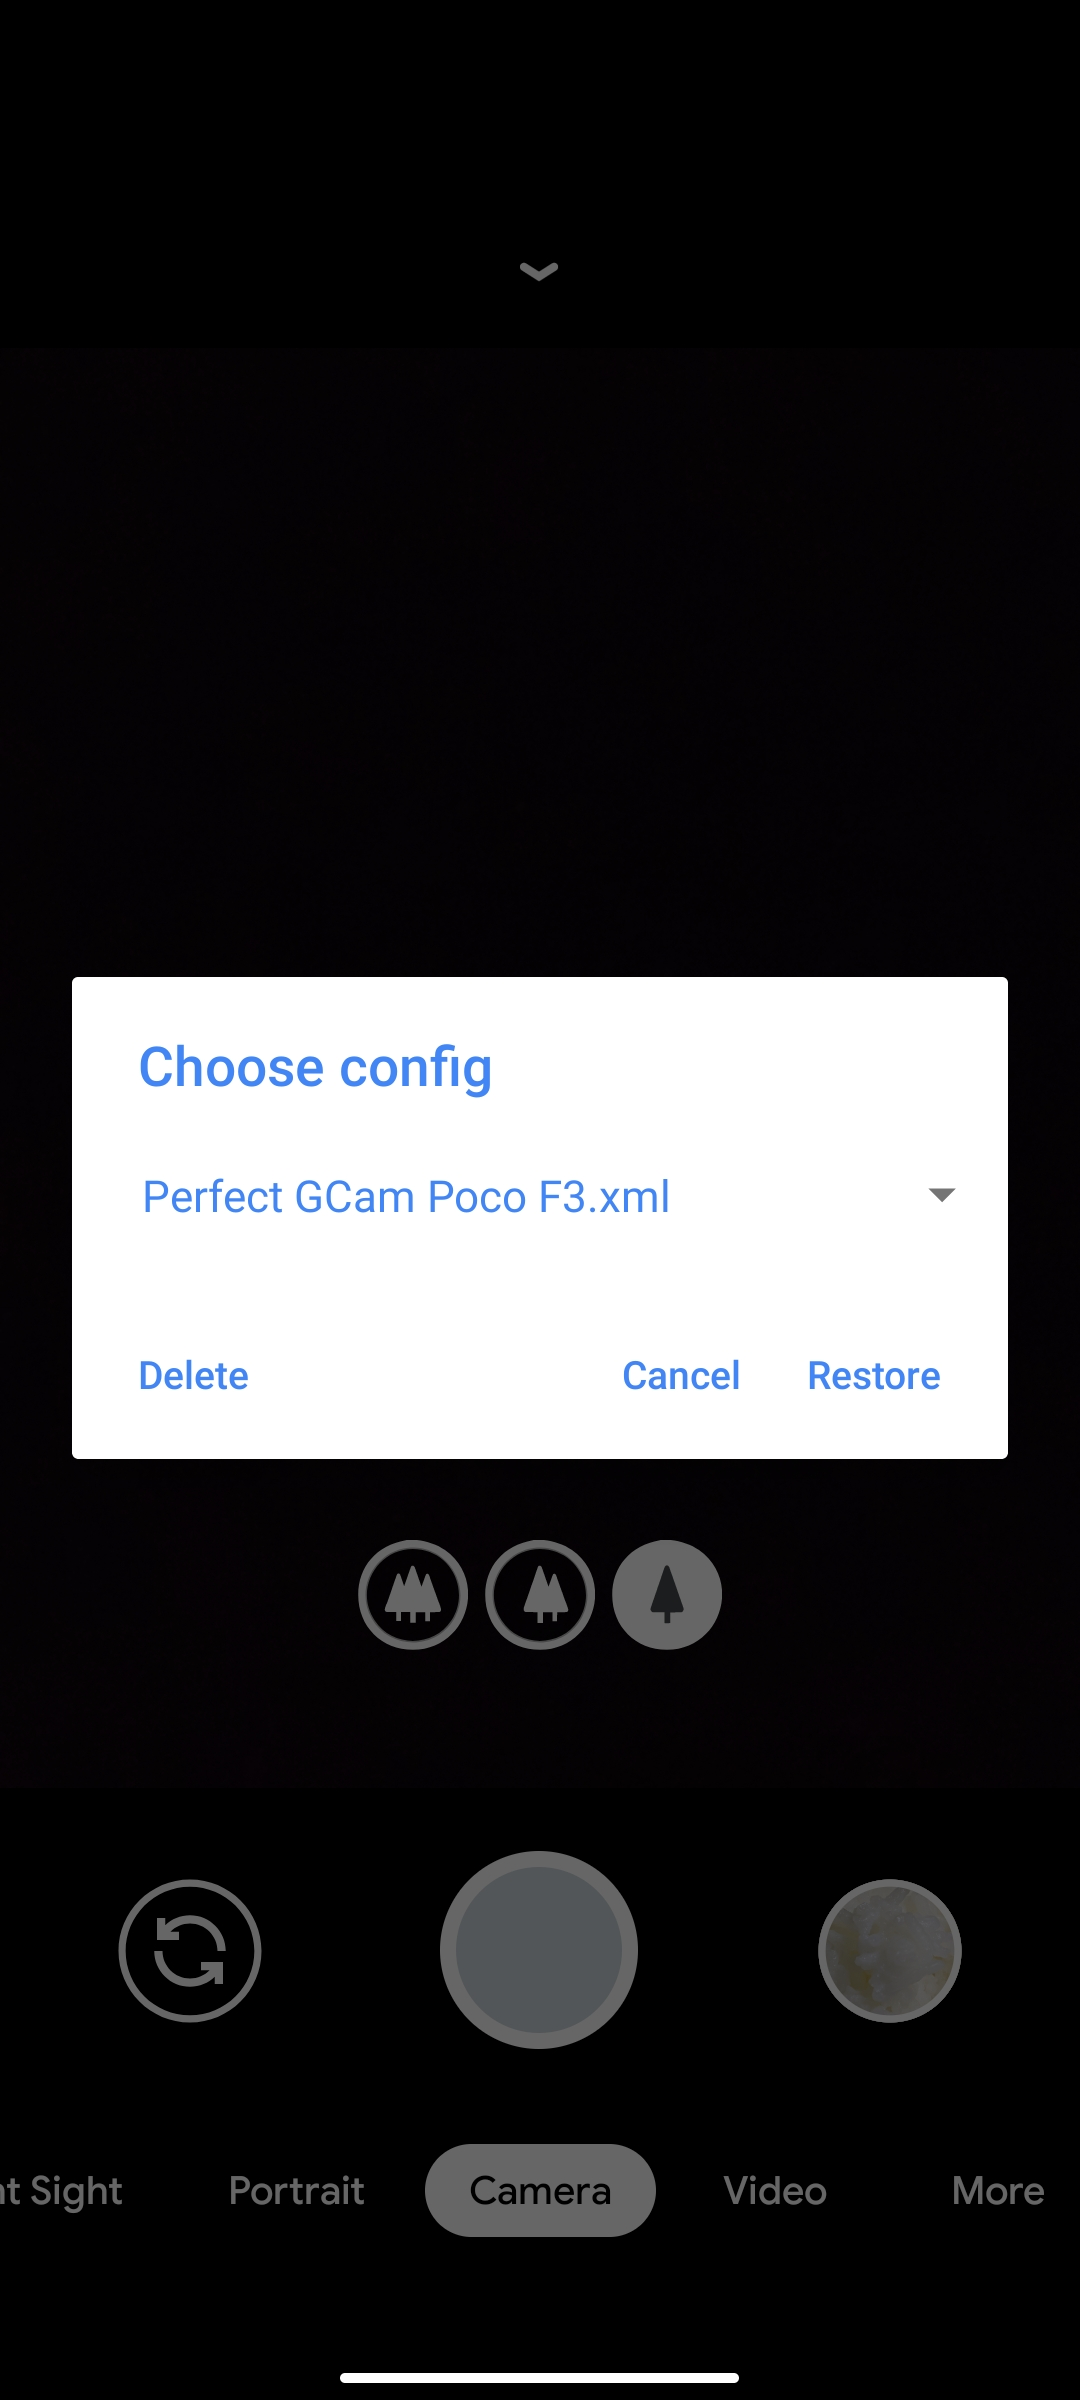 Screenshot_2021-09-01-15-00-27-624_com.google.android.GoogleCameraEng.jpg